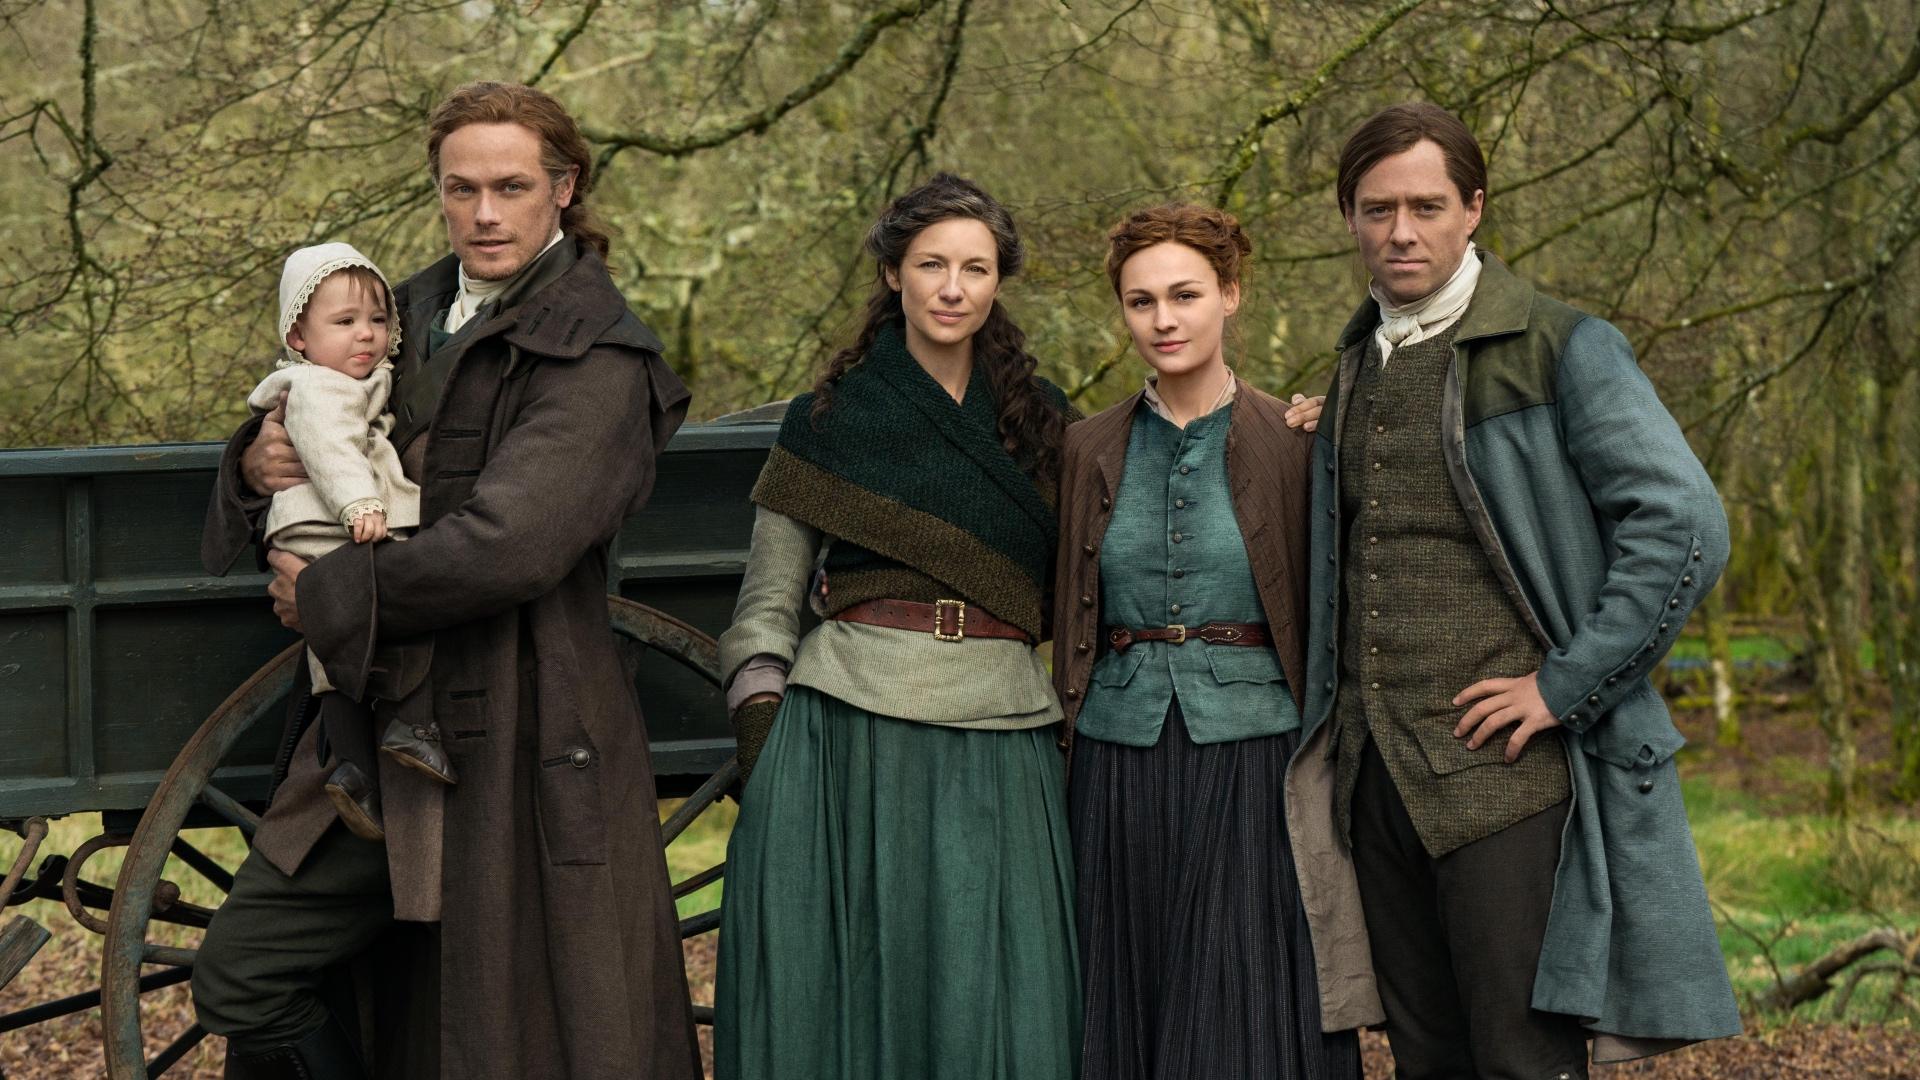 8 Things We Want to See in 'Outlander' Season 5